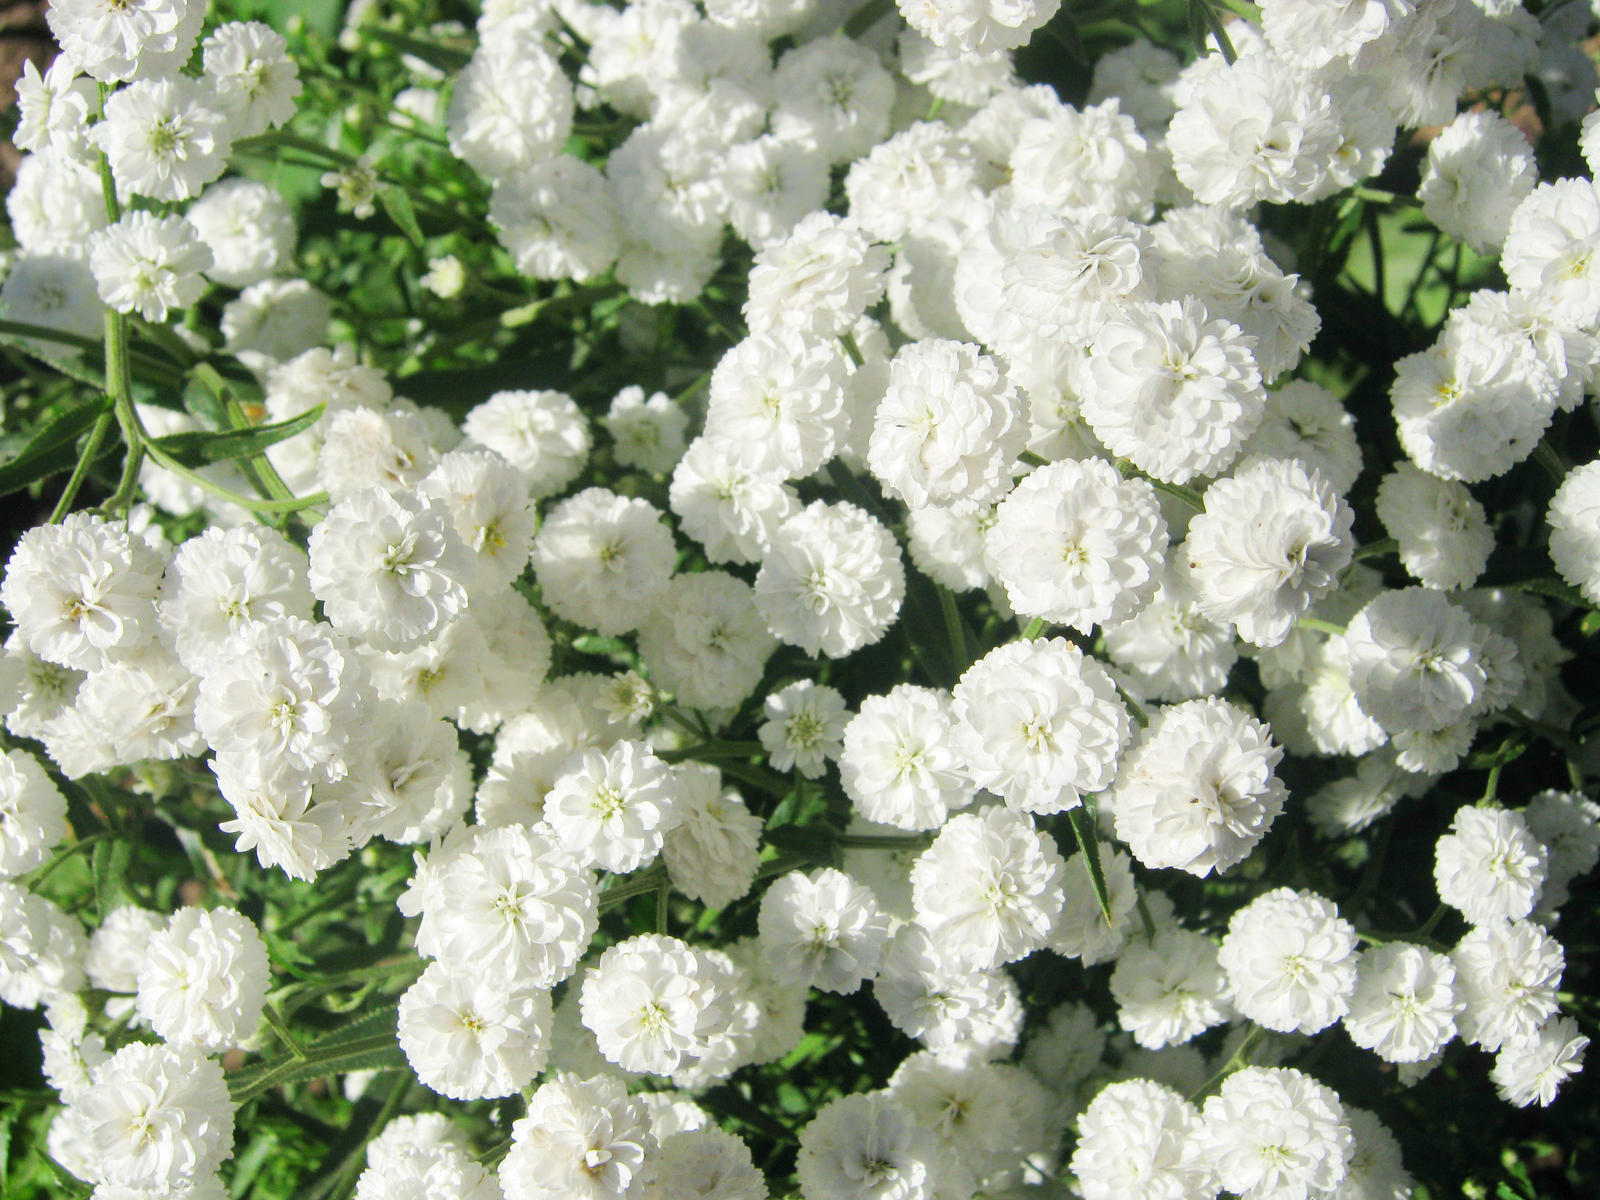 White Flowers Tumblr Dress Images